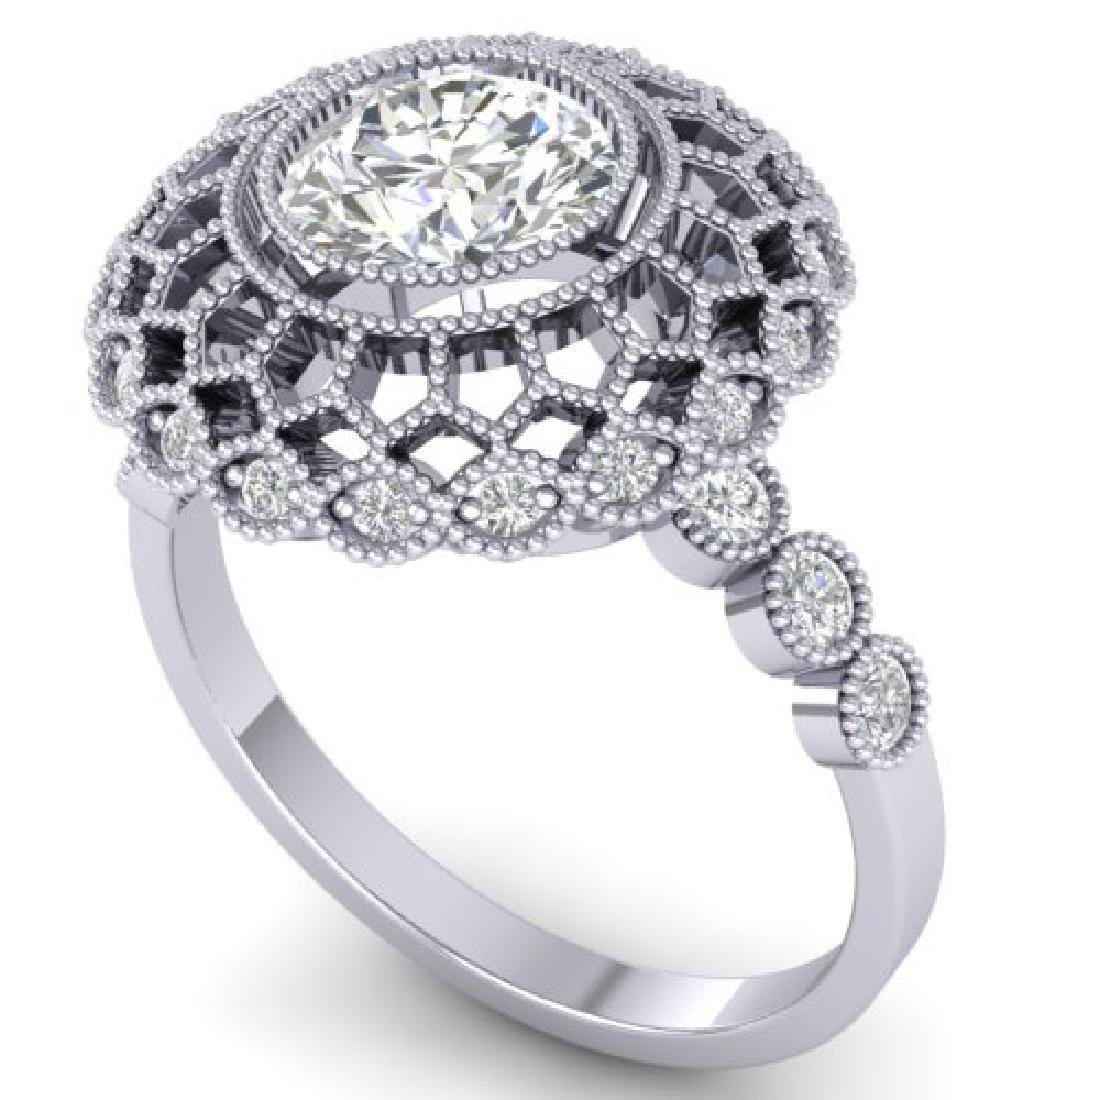 1.5 CTW Certified VS/SI Diamond Art Deco Ring 18K White - 2